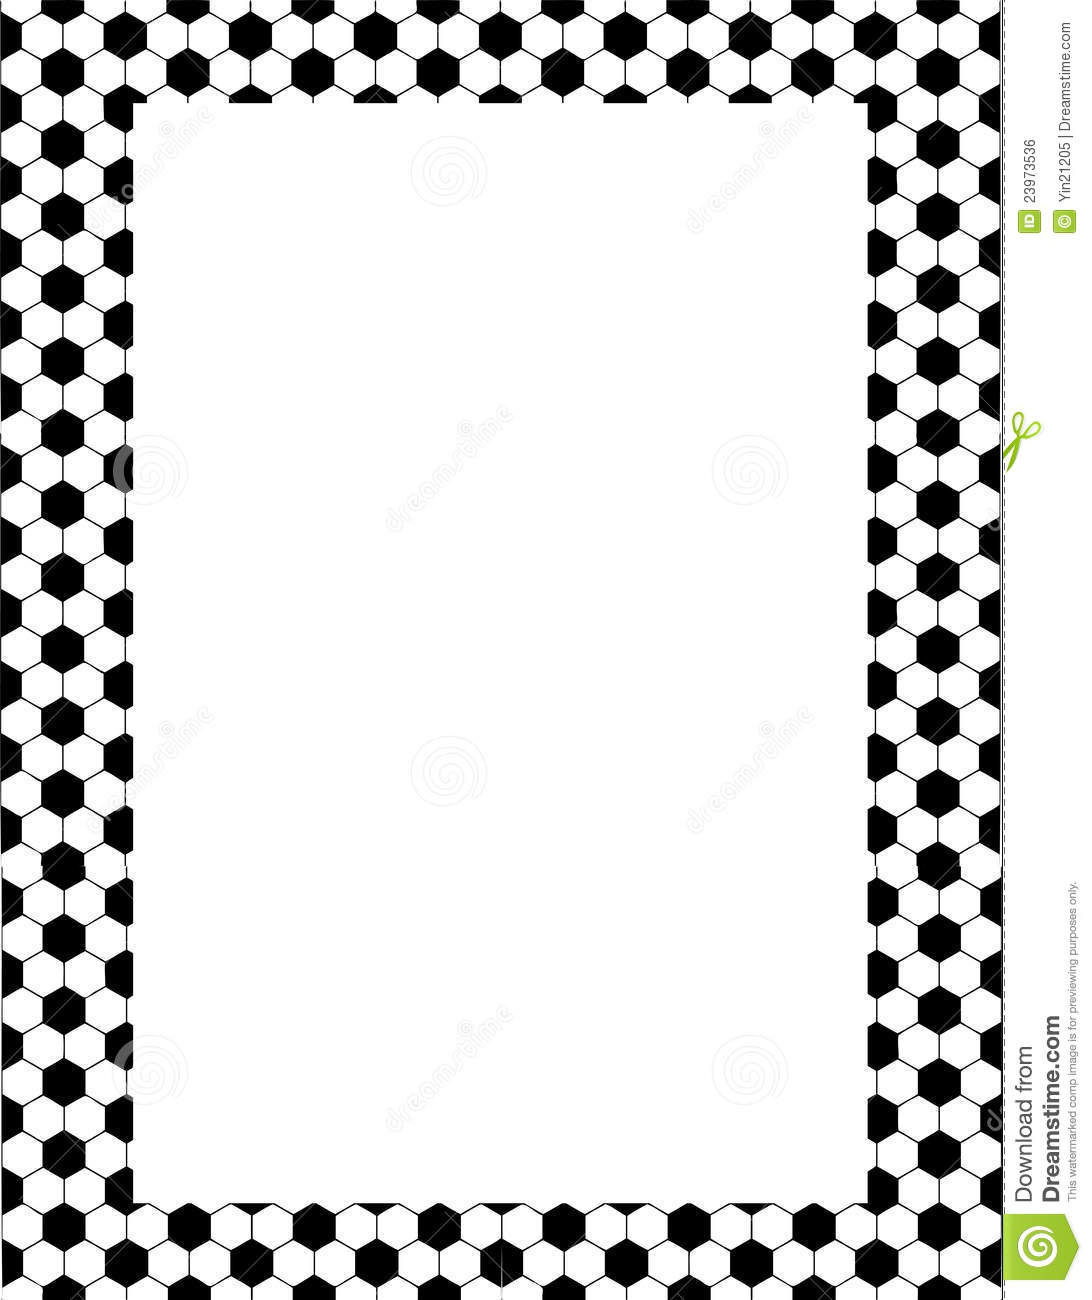 Soccer Clip Art Border Clipart Panda